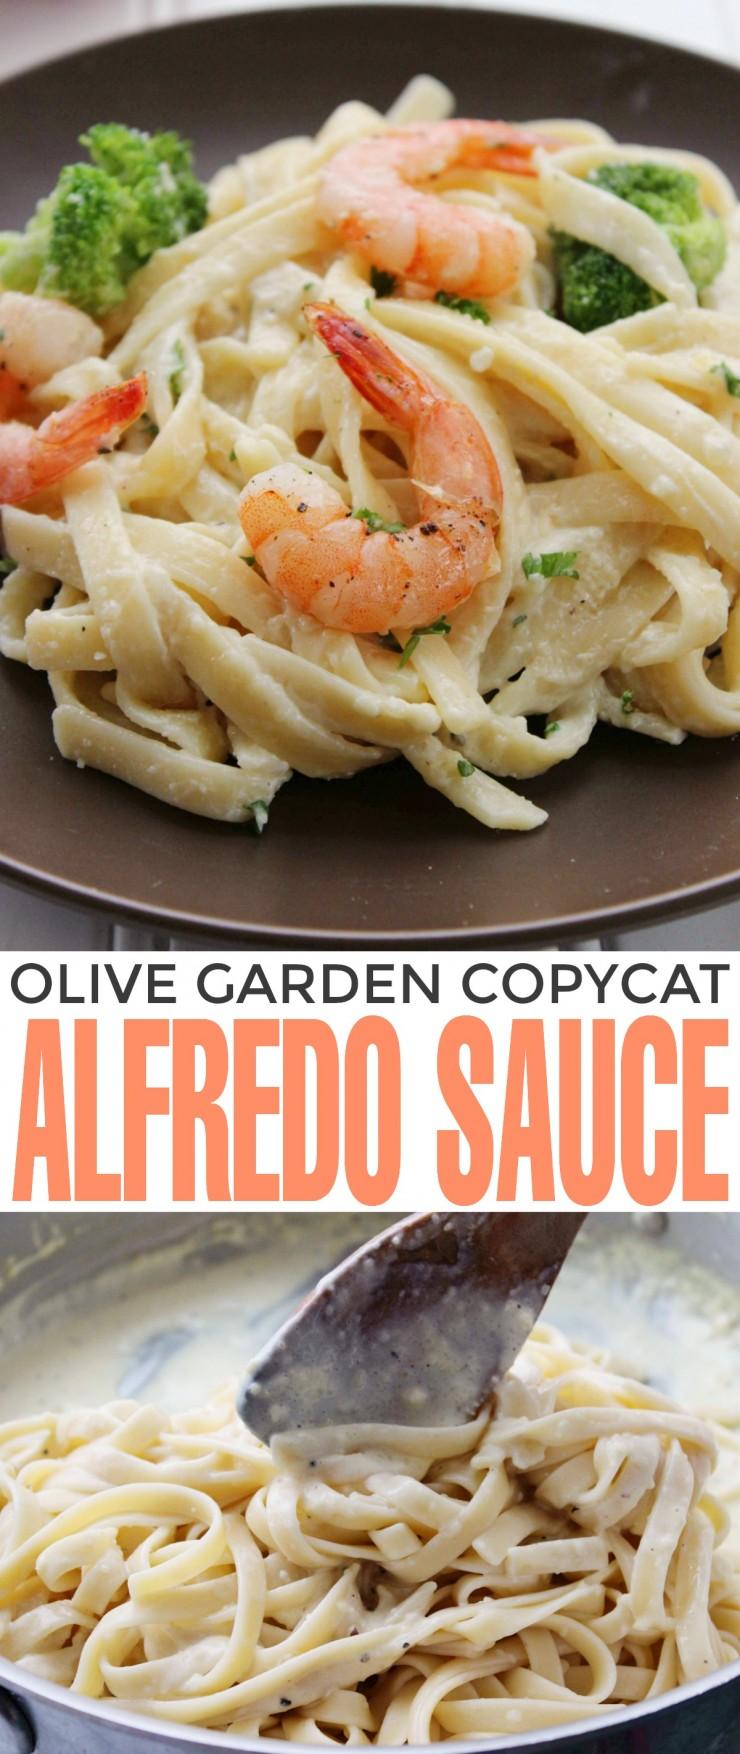 Olive garden alfredo sauce copycat recipe life love liz - Olive garden alfredo sauce recipe copycat ...